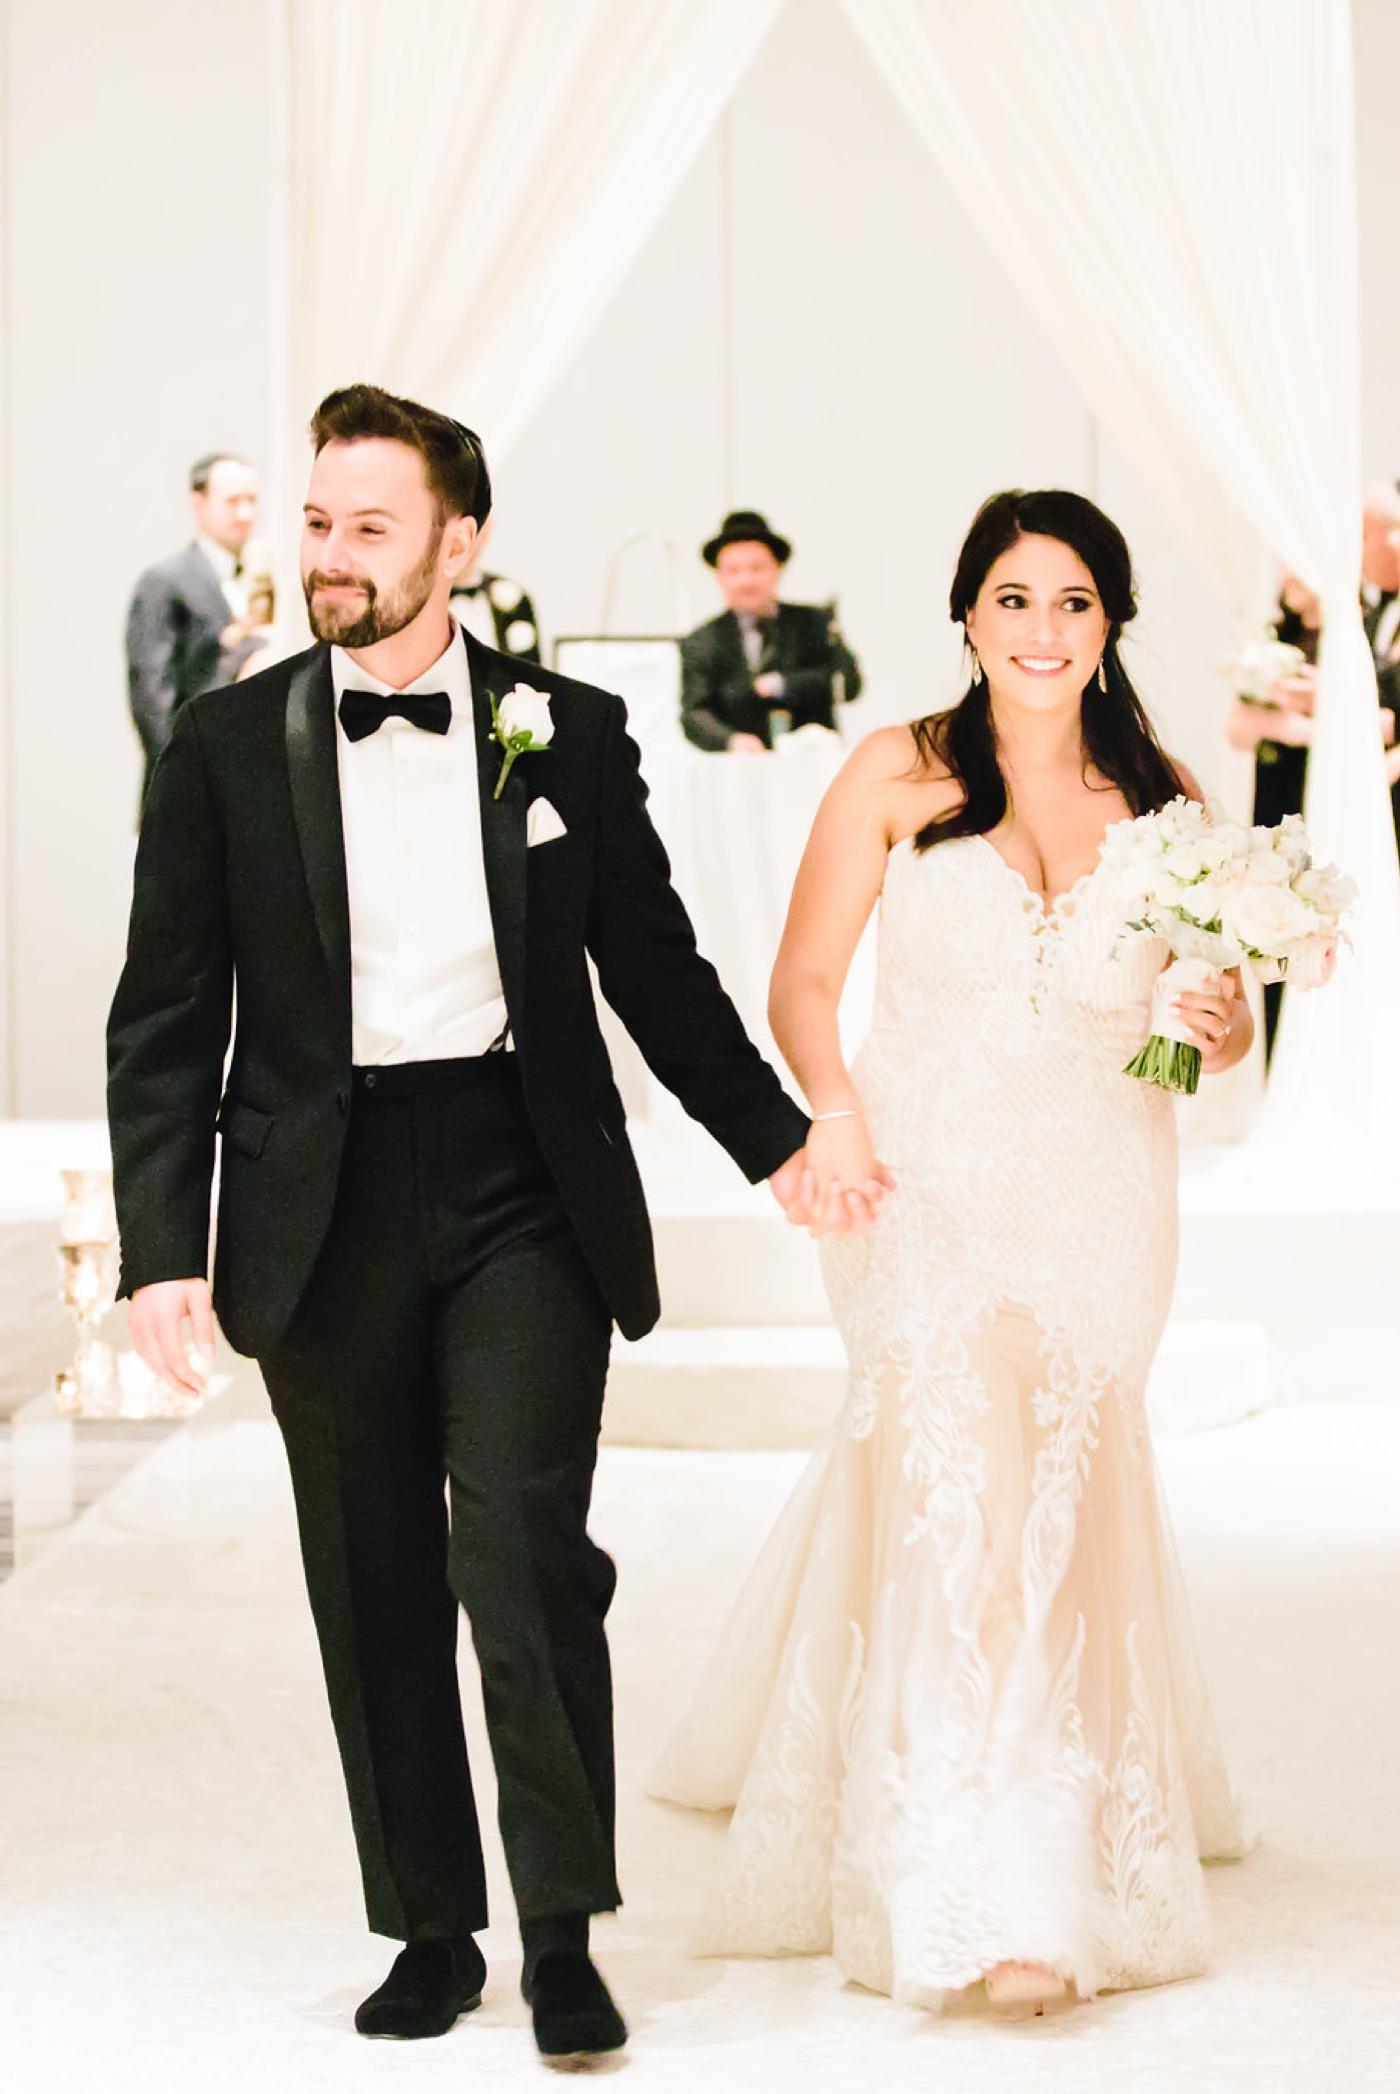 chicago-fine-art-wedding-photography-douglas49